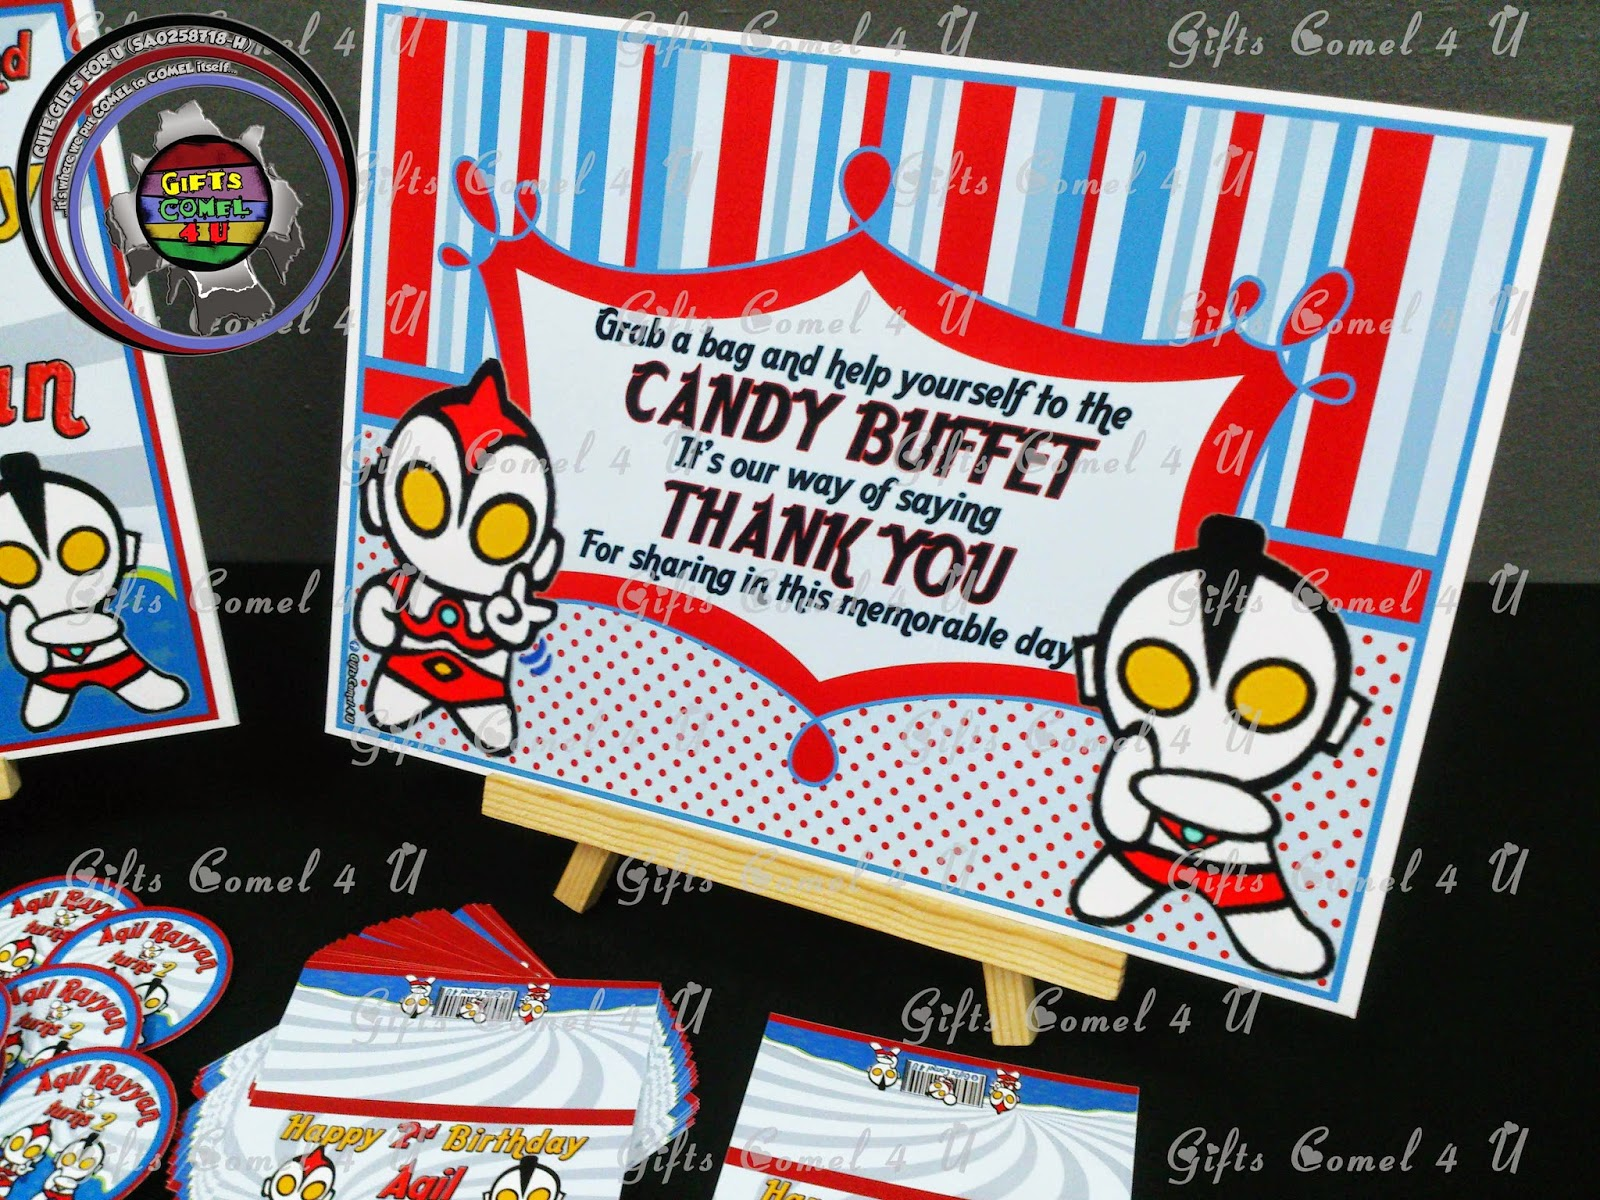 Gifts Comel 4 U Ordered by Madam Diba Baby Ultraman redblue